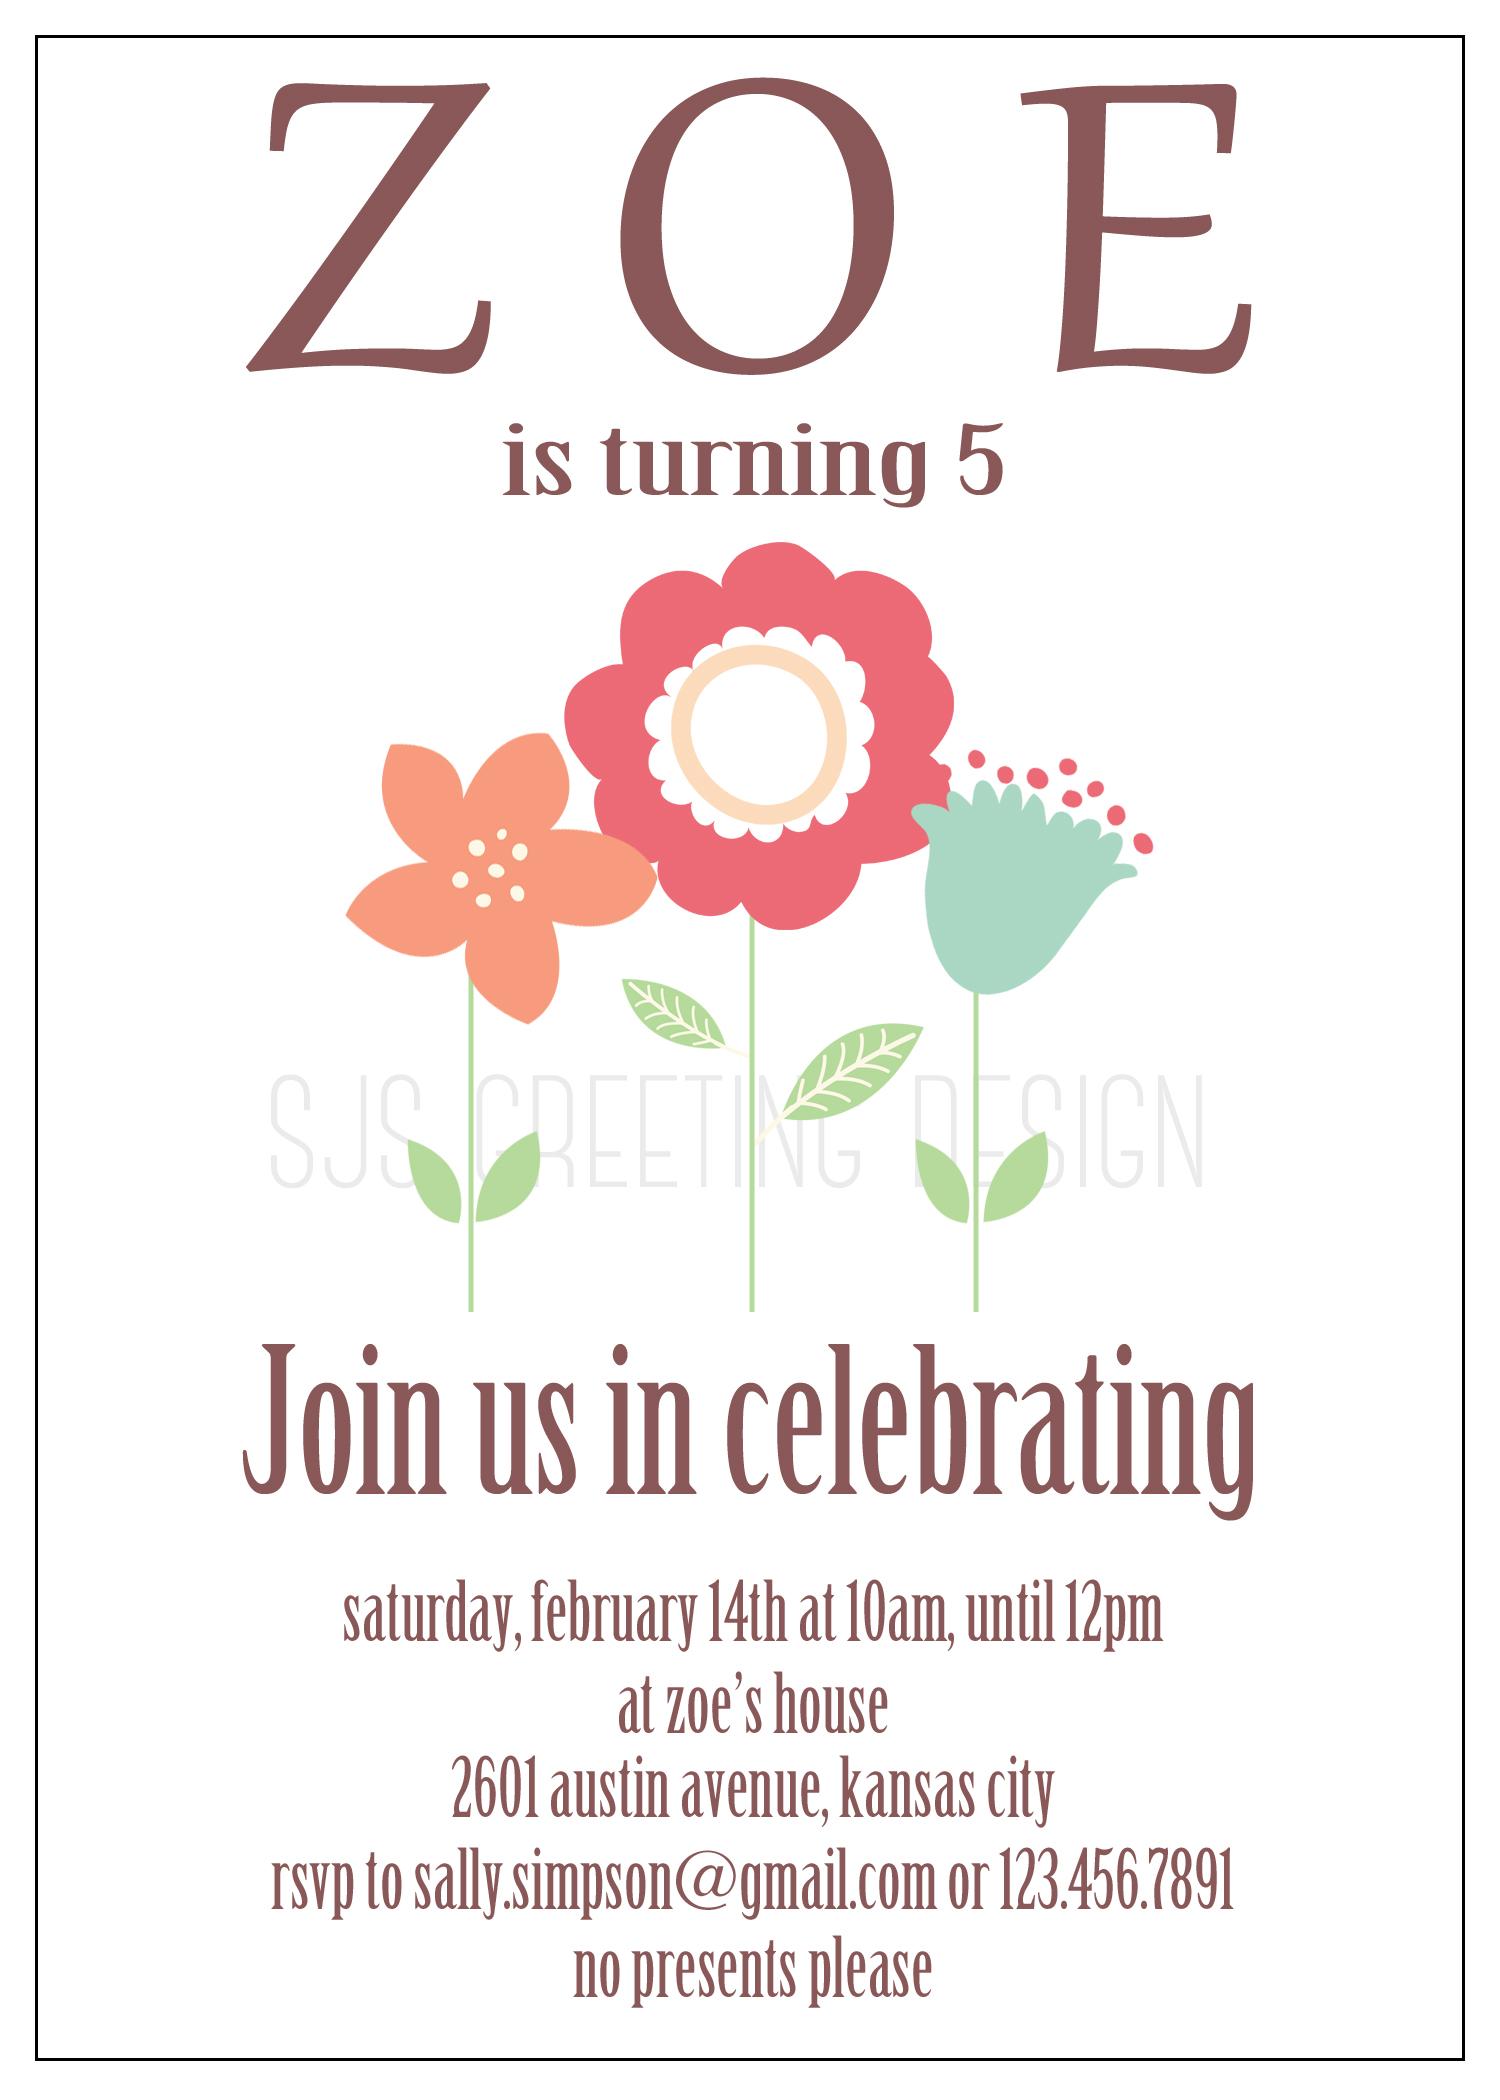 Birthday invitation zoe sjsgreetingdesign zoe birthday invite stopboris Gallery